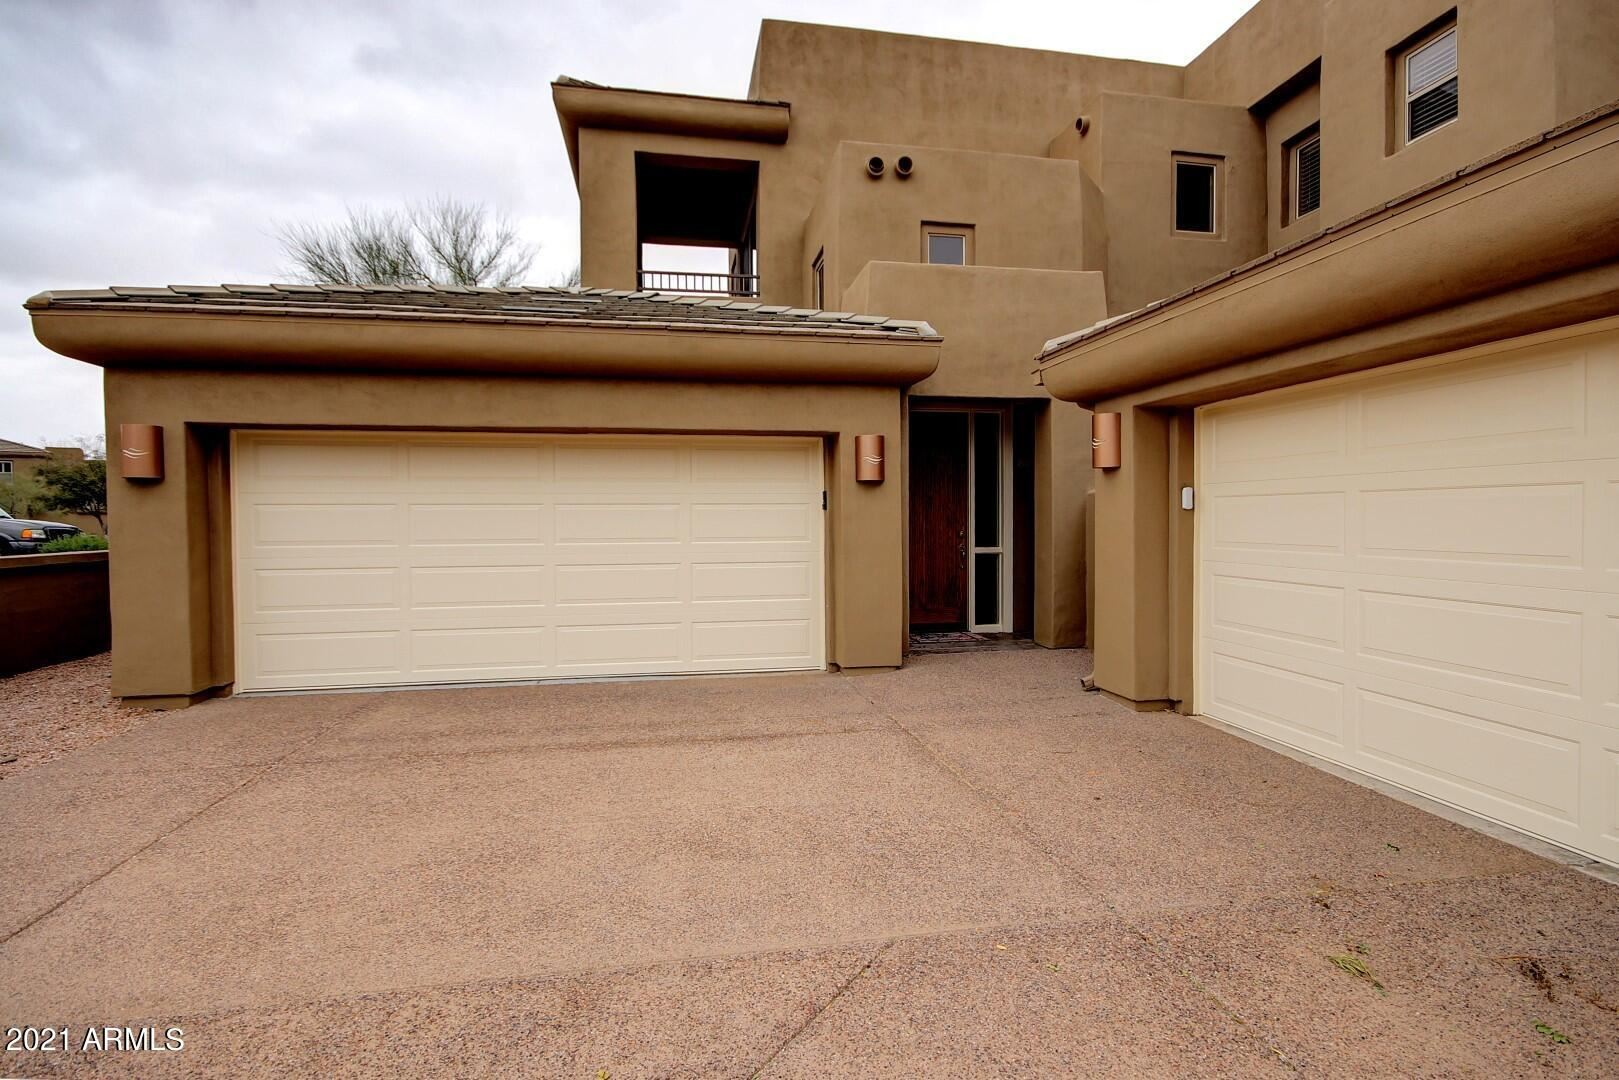 Photo of 14850 E GRANDVIEW Drive #251, Fountain Hills, AZ 85268 (MLS # 6267295)